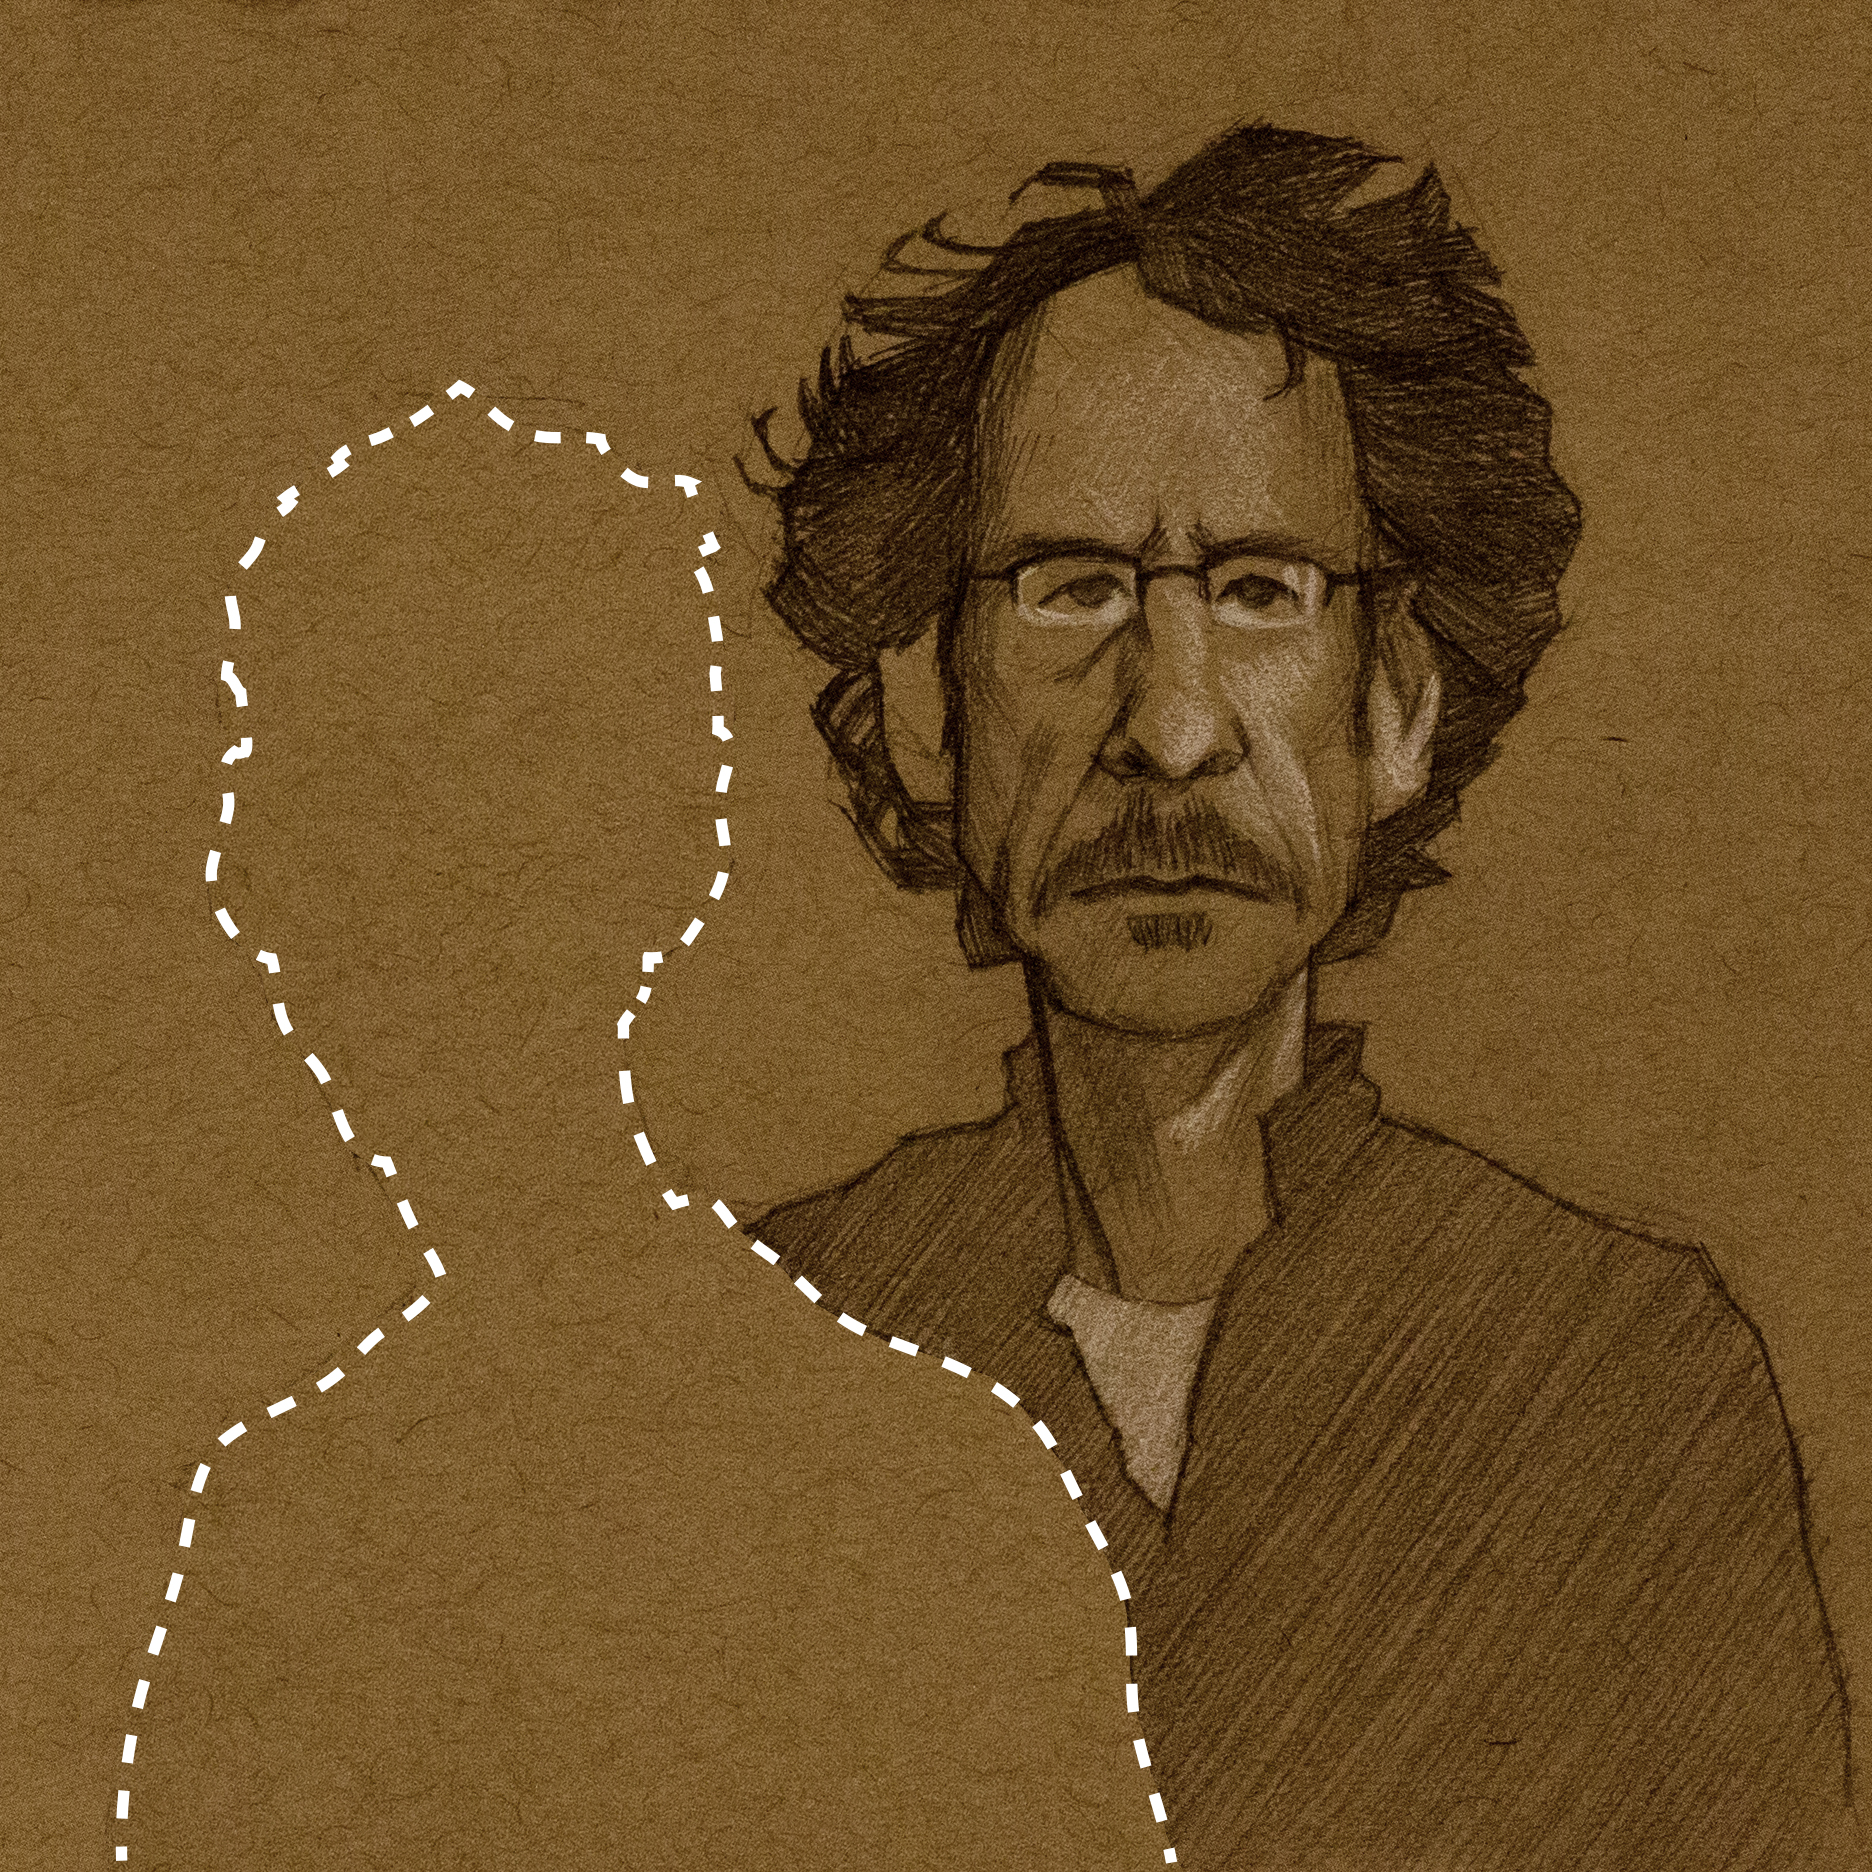 Joel Coen illustration by the incomparable Hugo Marmugi